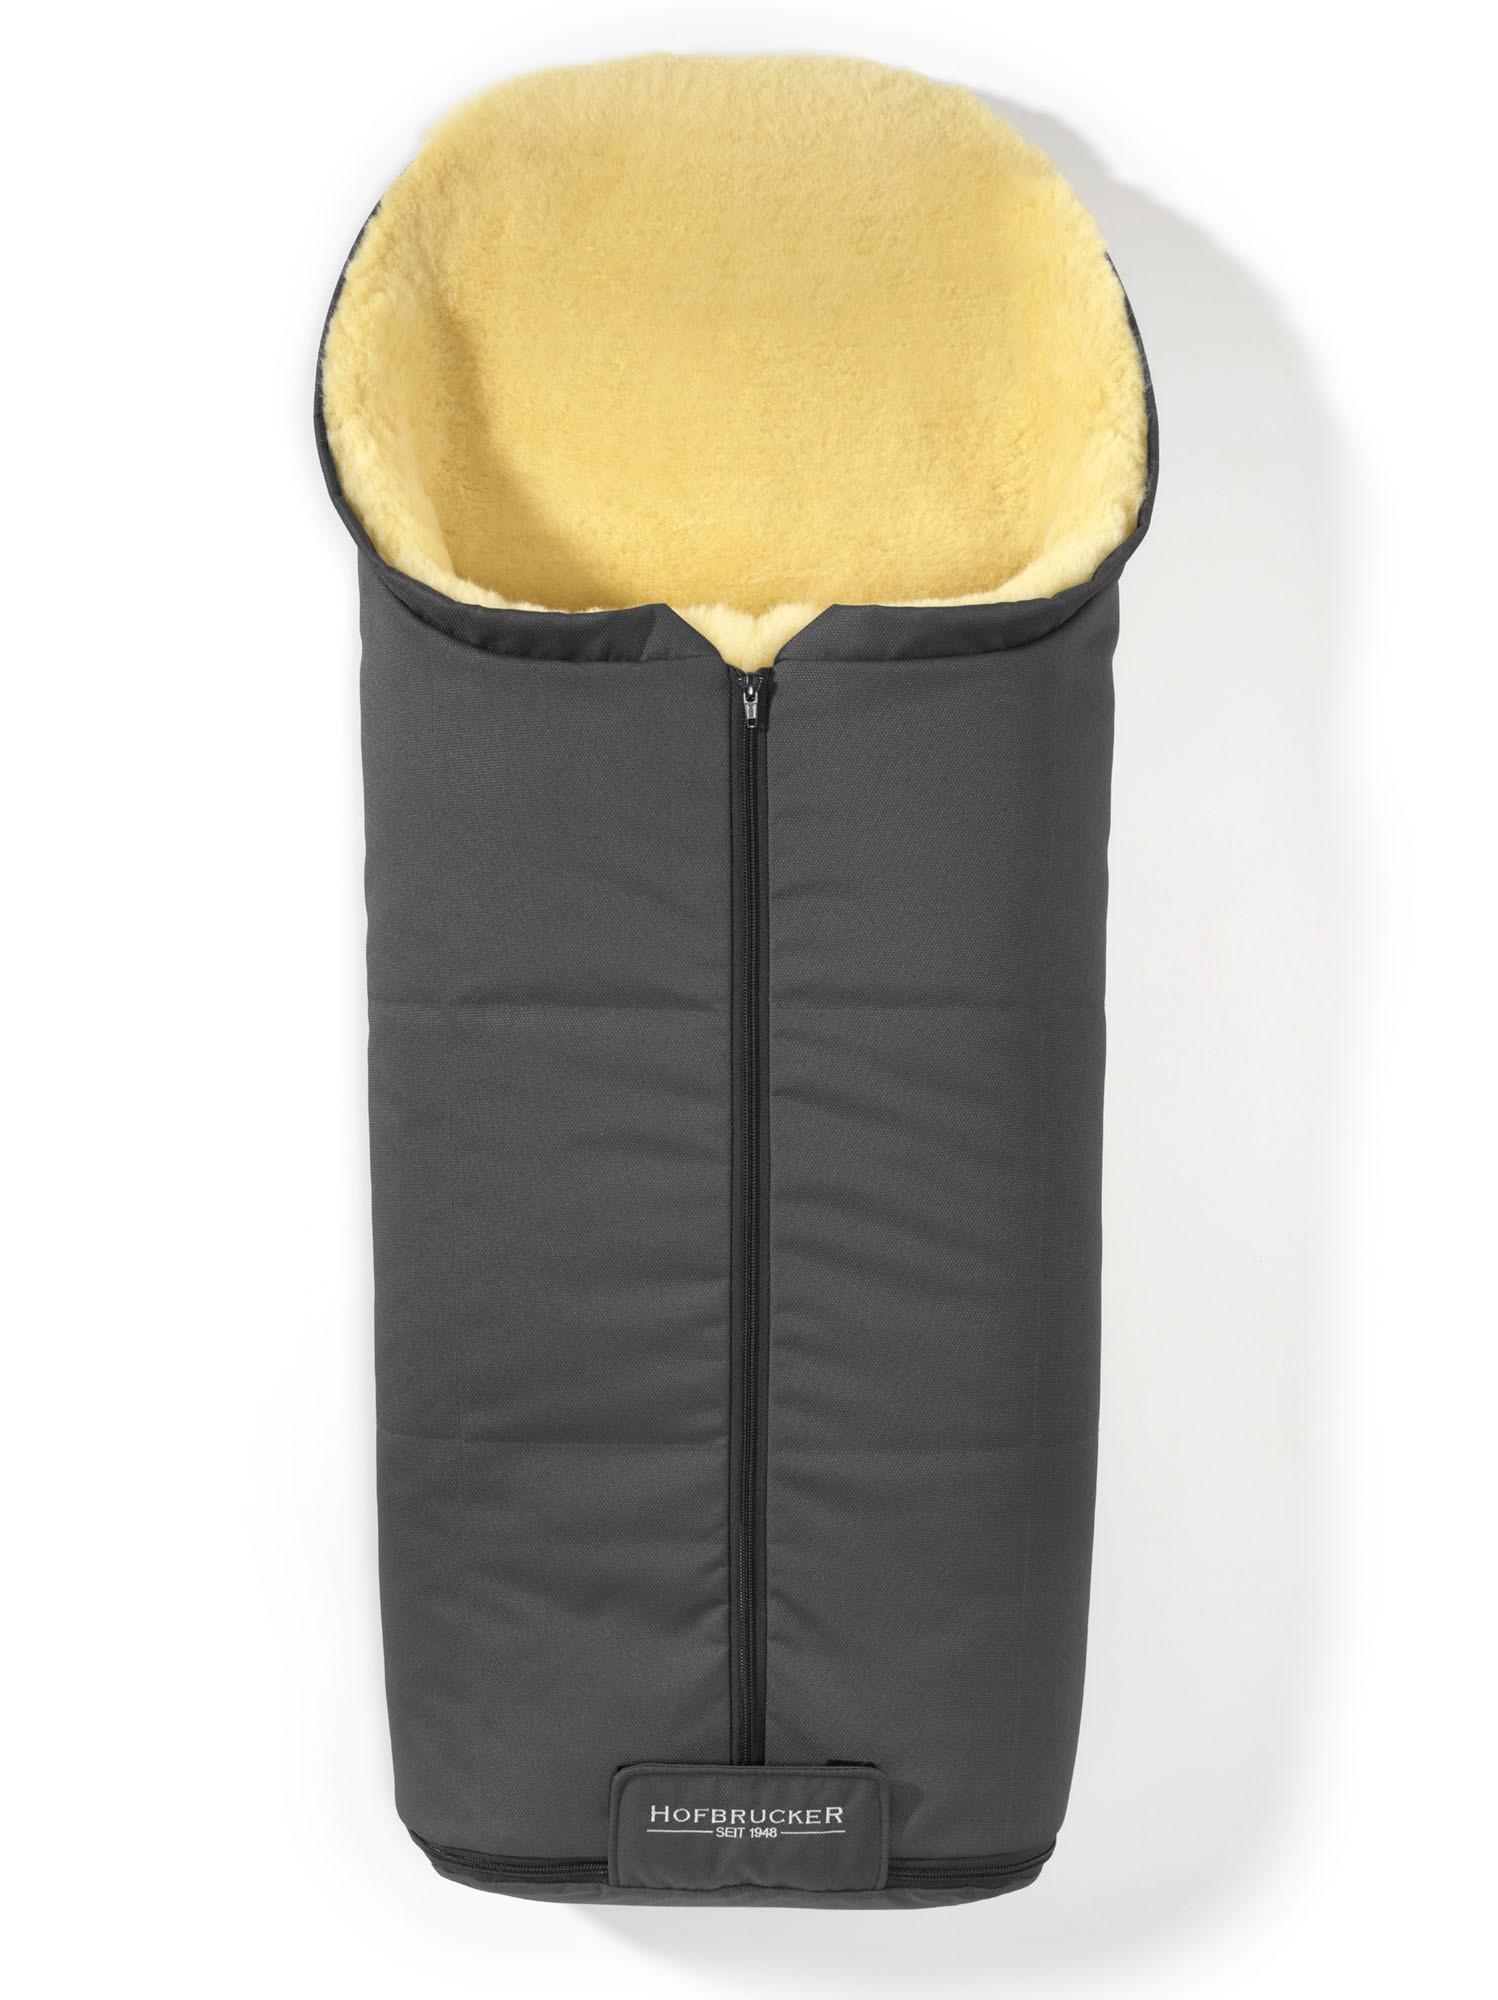 hofbrucker lammfell fu sack iglu f r kinderwagen und buggy. Black Bedroom Furniture Sets. Home Design Ideas